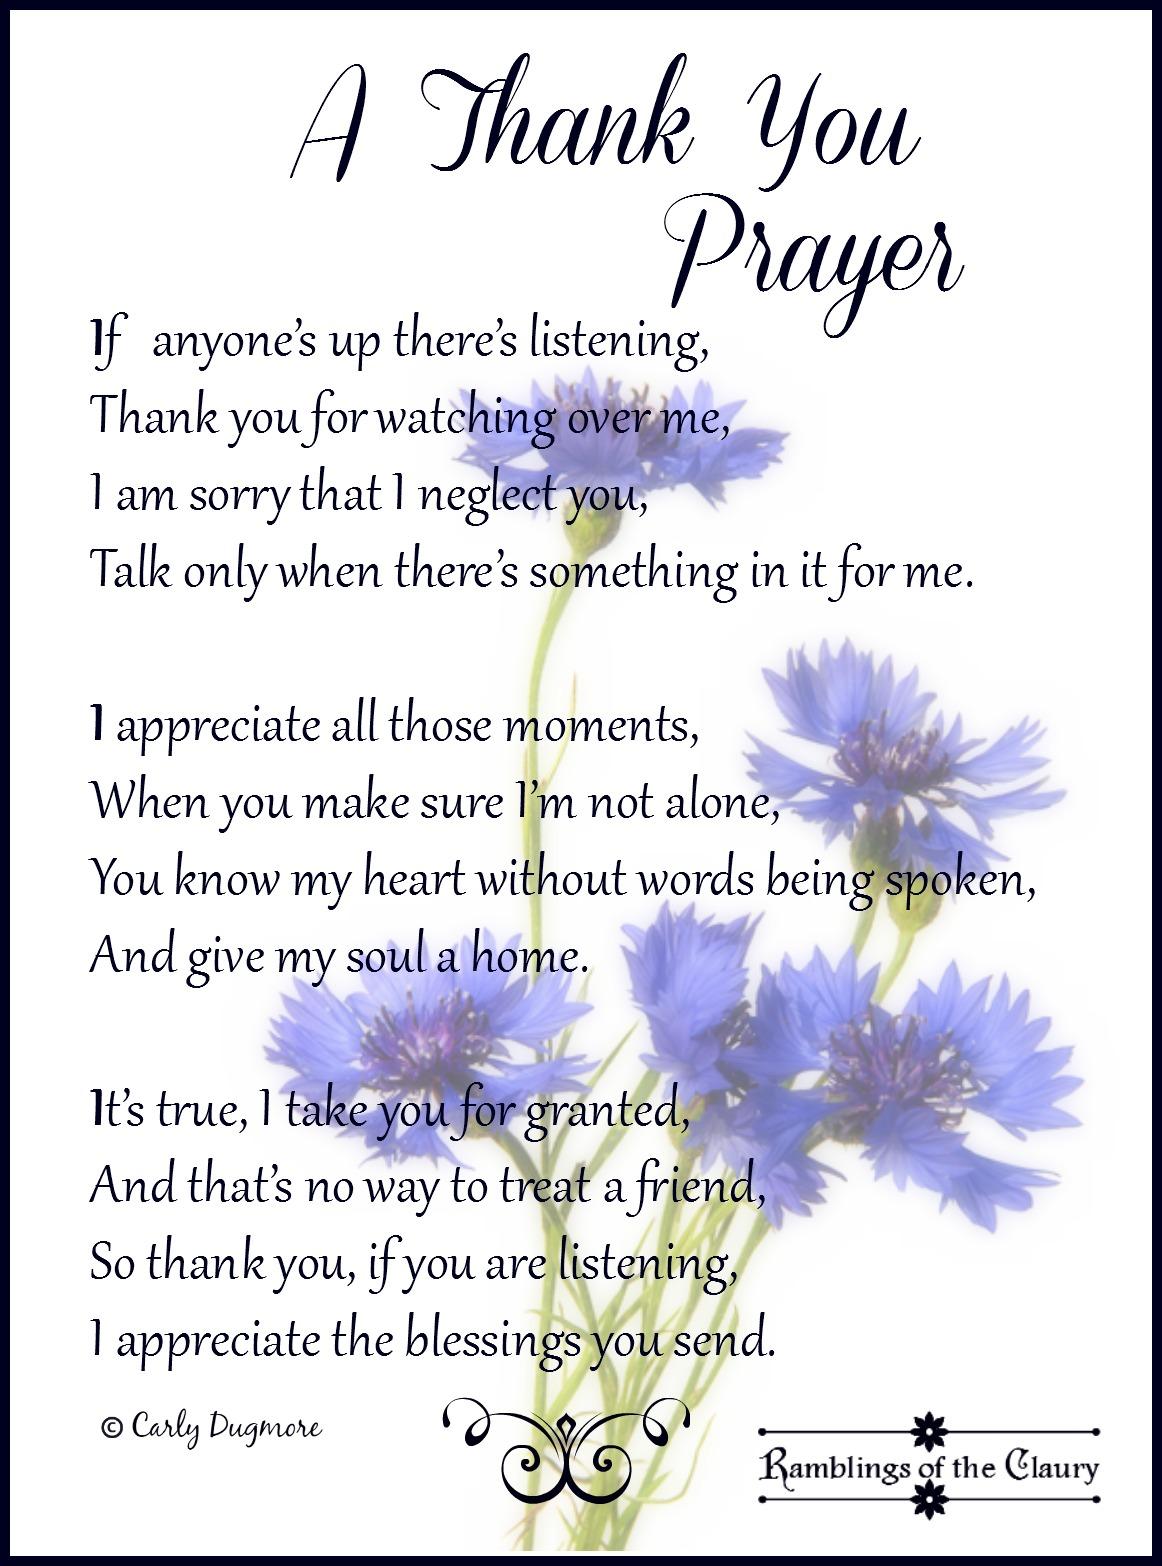 A Thank You Prayer